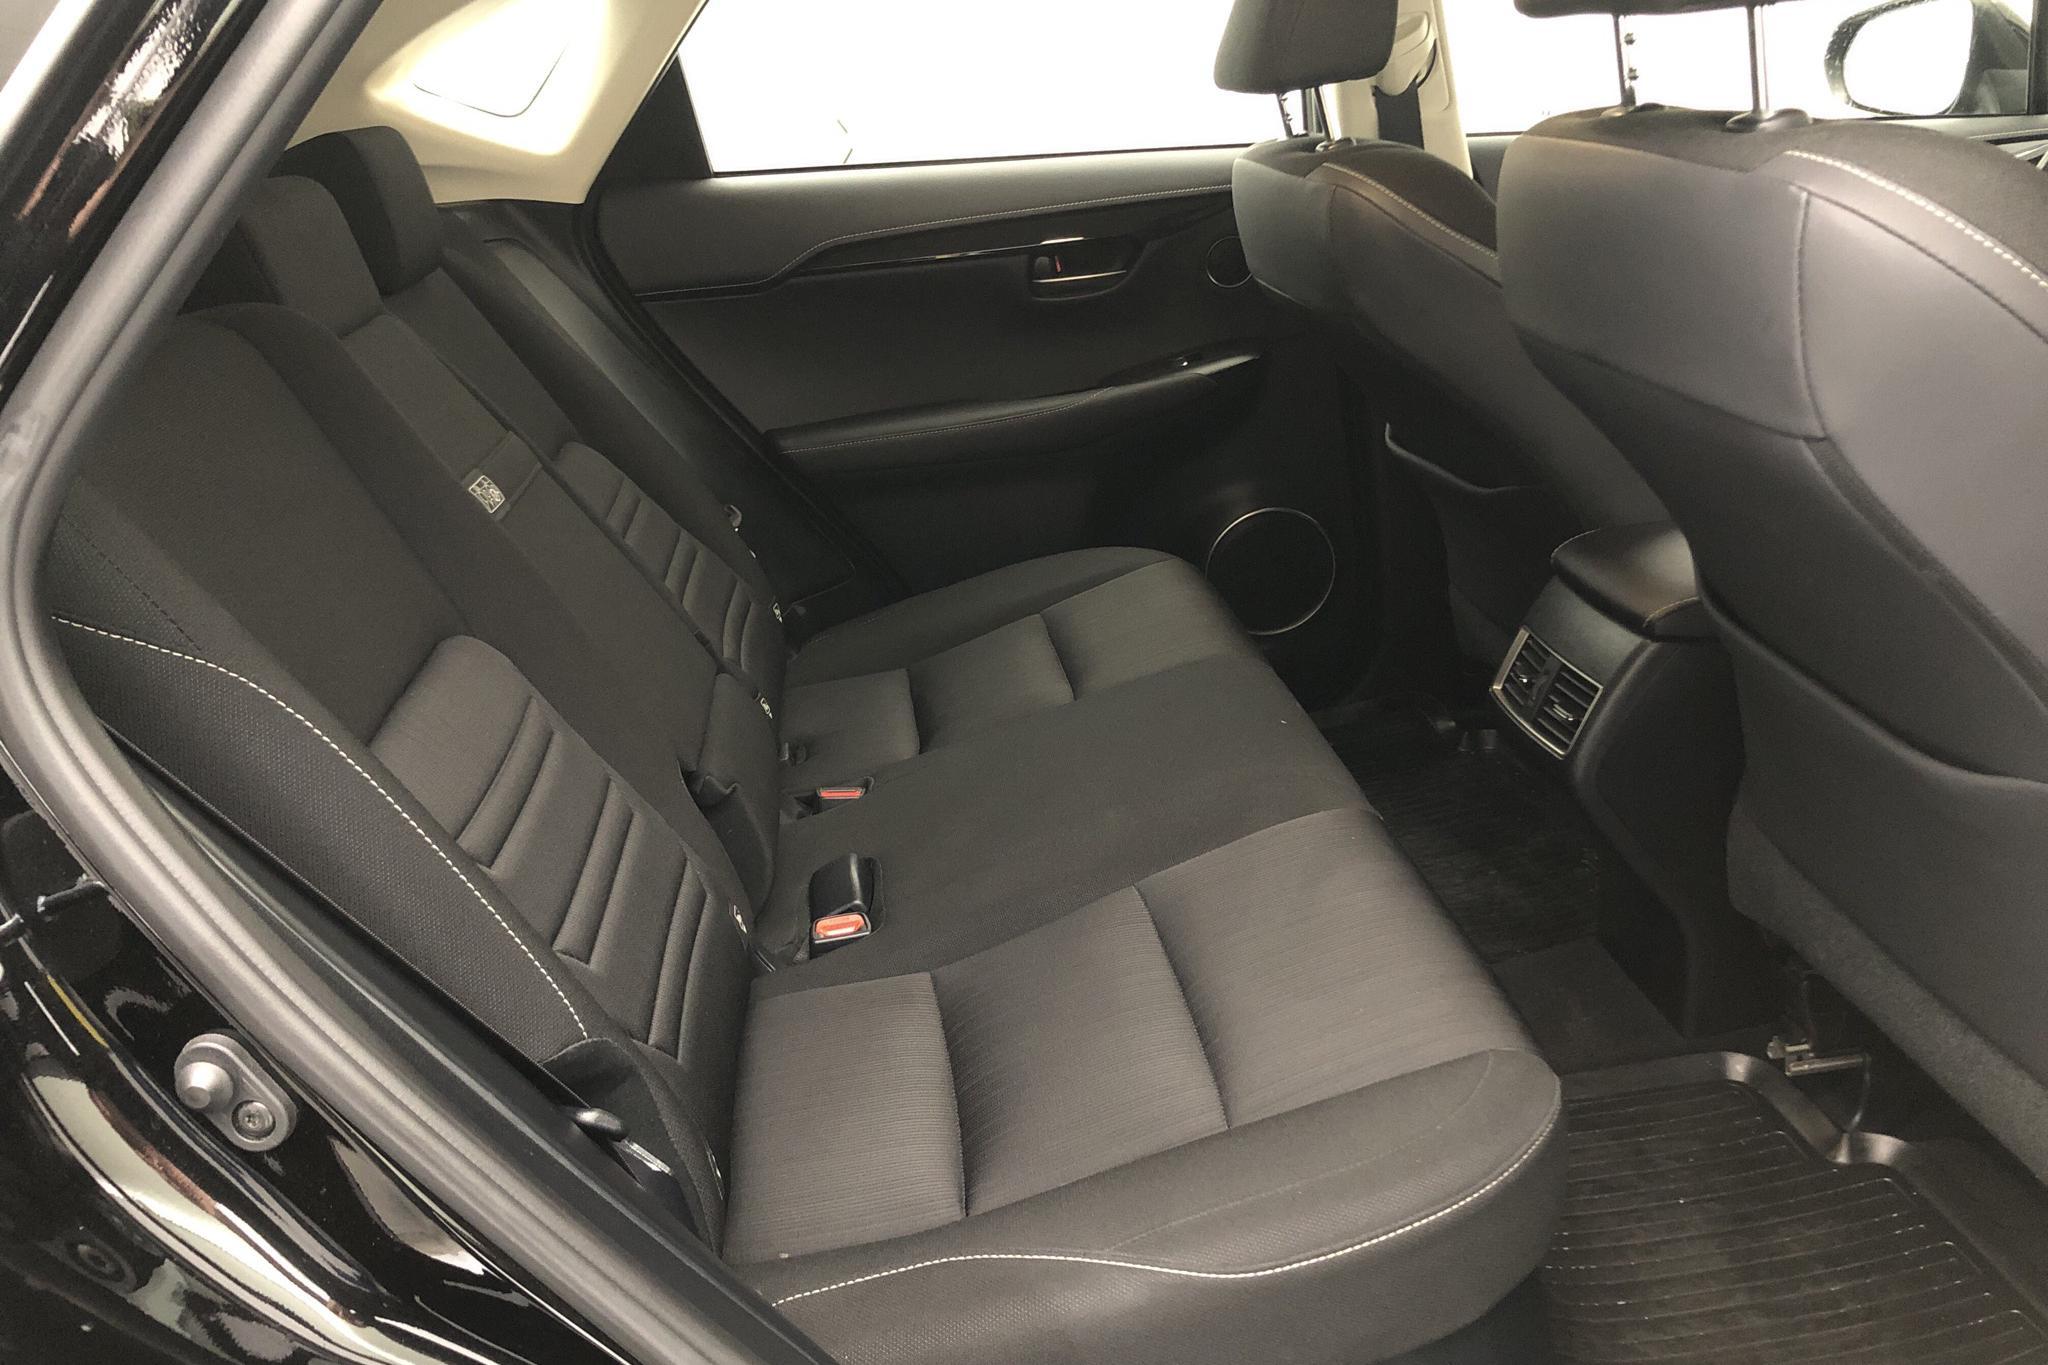 Lexus NX 300h (197hk) - 65 630 km - Automatic - black - 2018